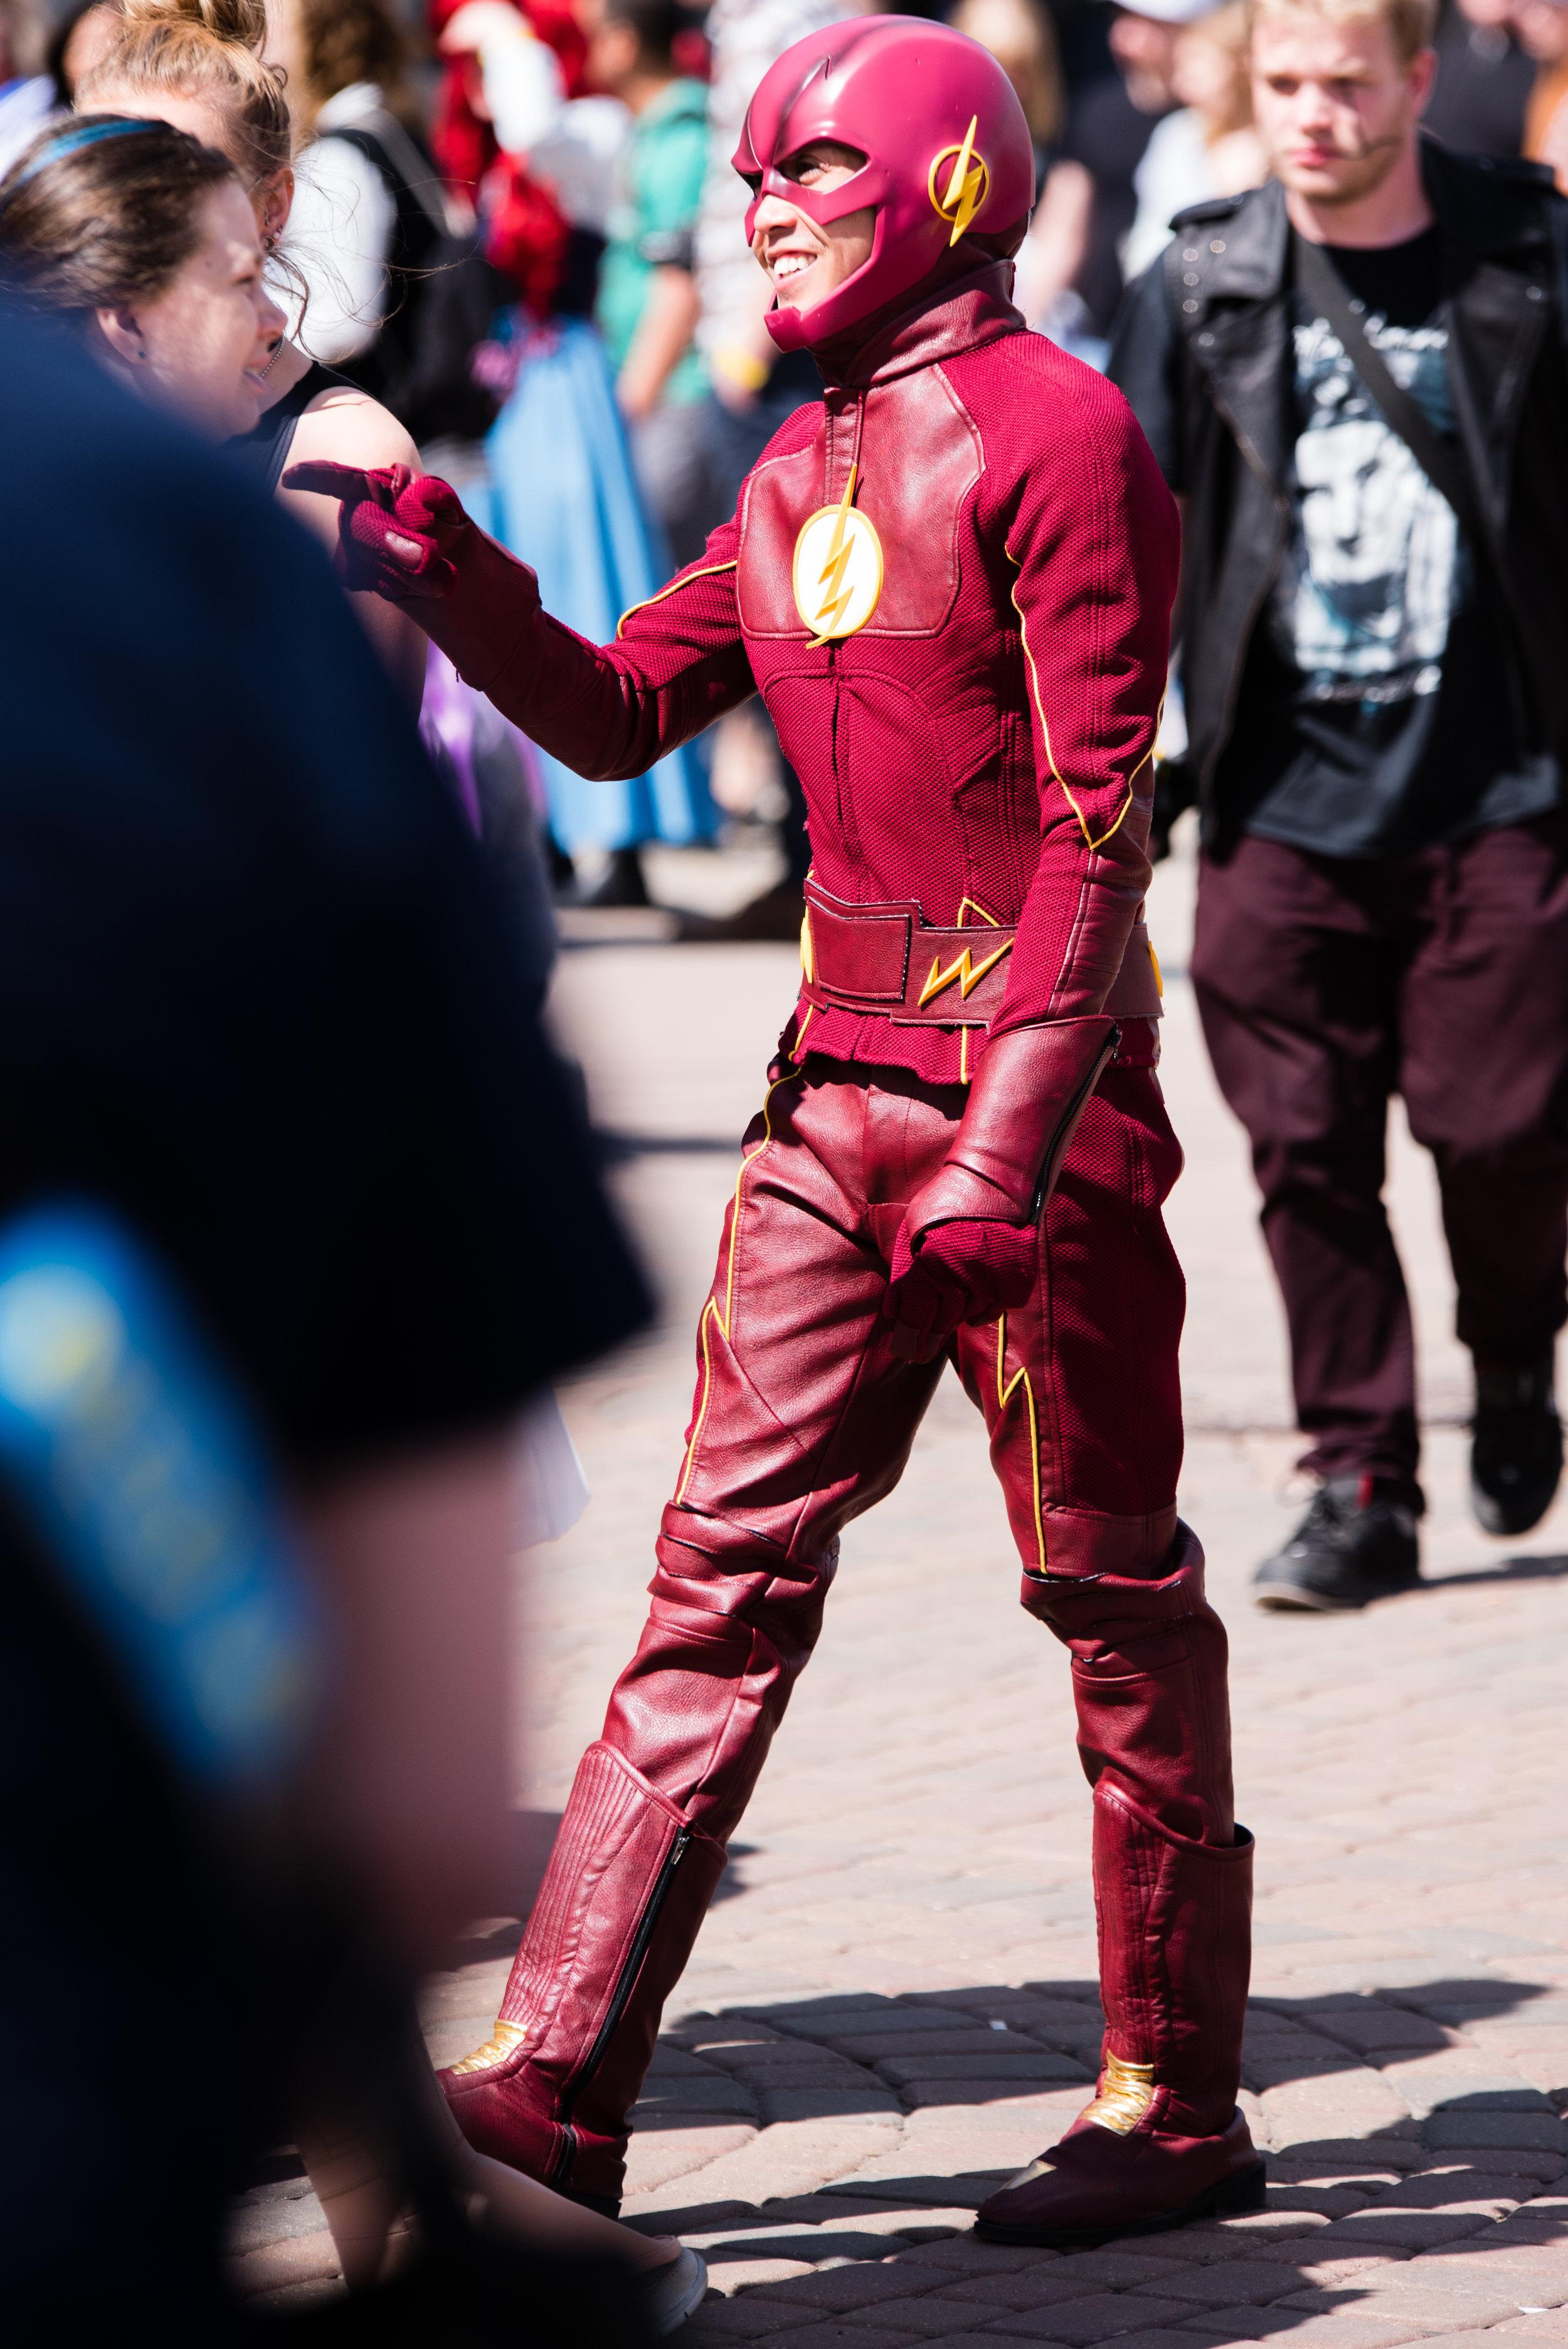 Comic Expo-7879.jpg